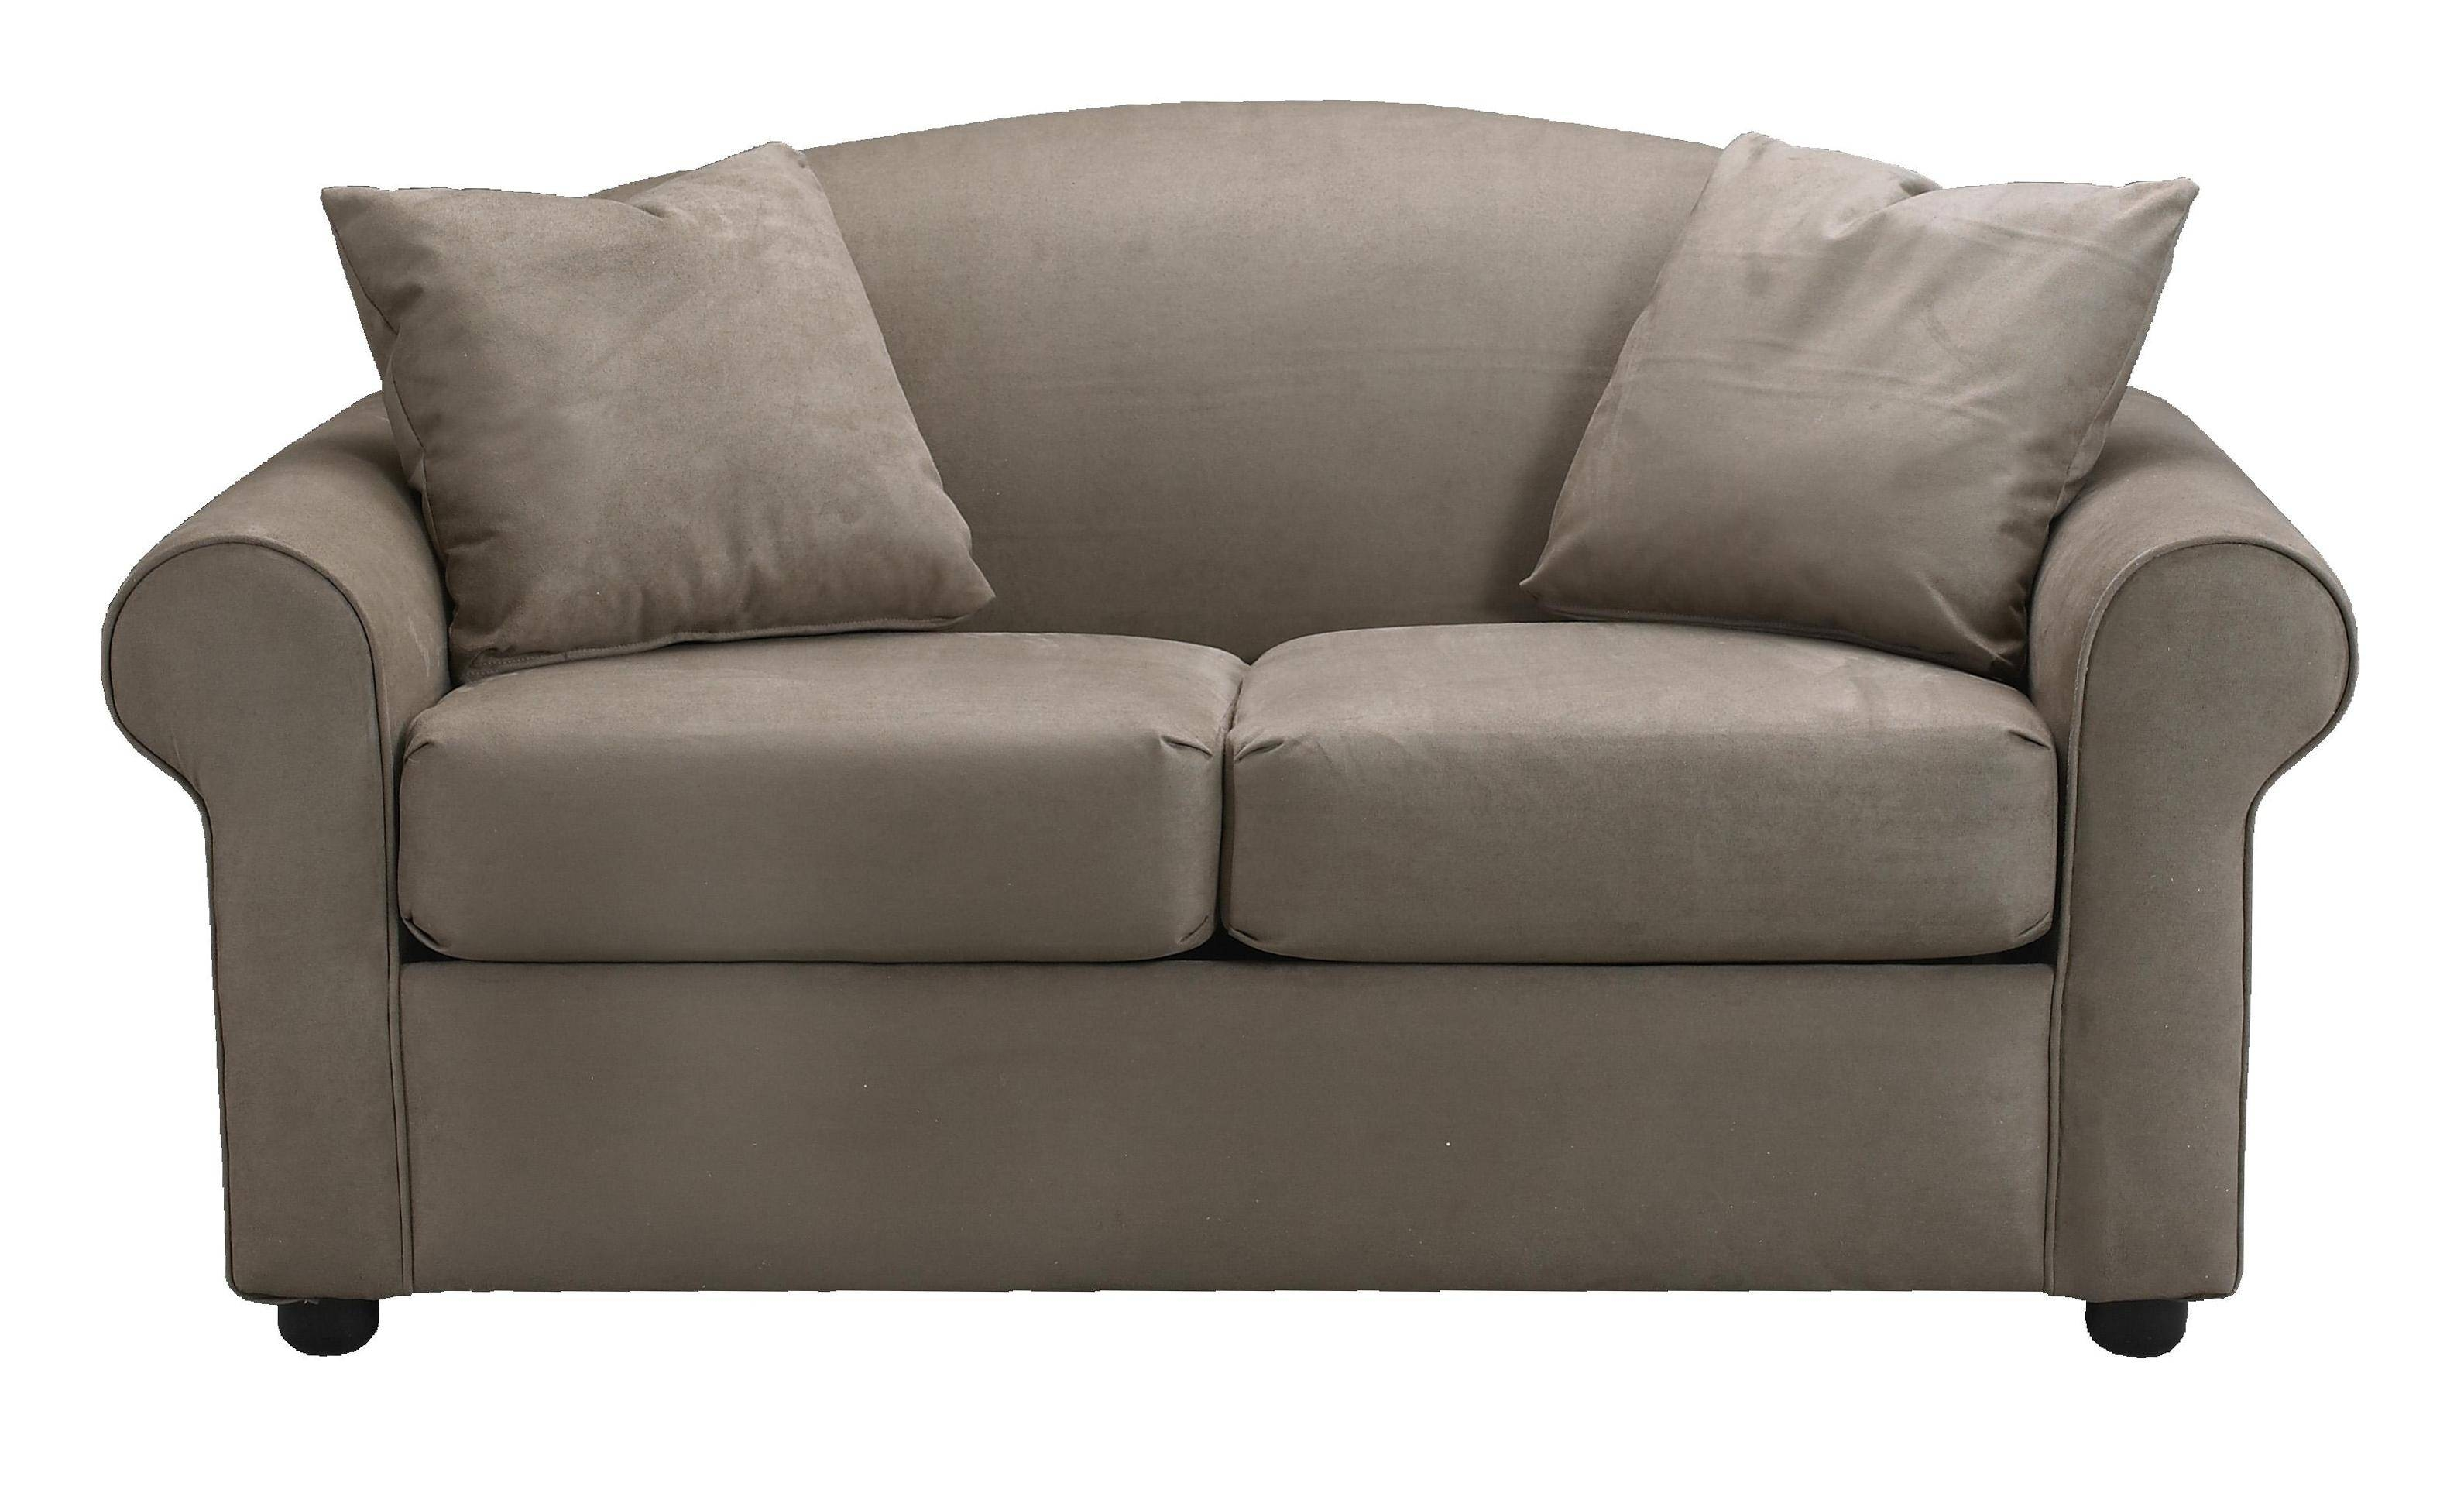 Good Twin Sleeper Sofa Ikea 47 With Additional High Sleeper Bed in High Sleeper With Desk and Sofa (Image 8 of 30)